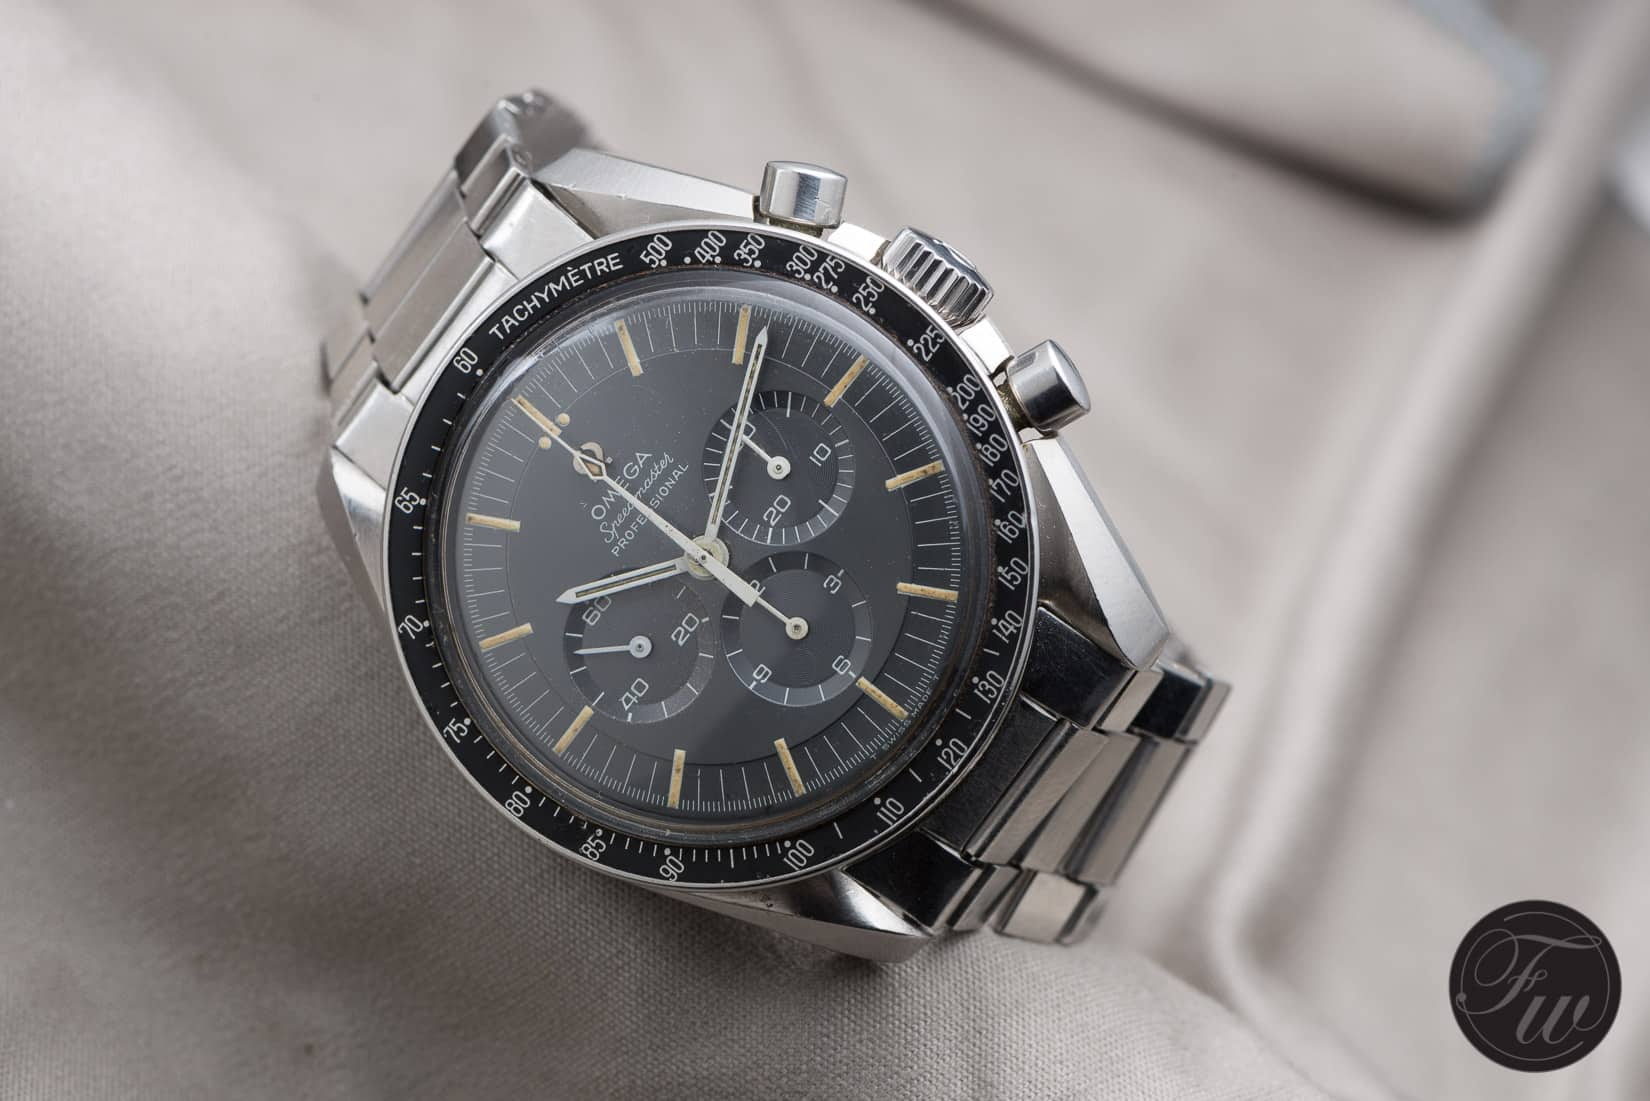 Moonwatch 145.012